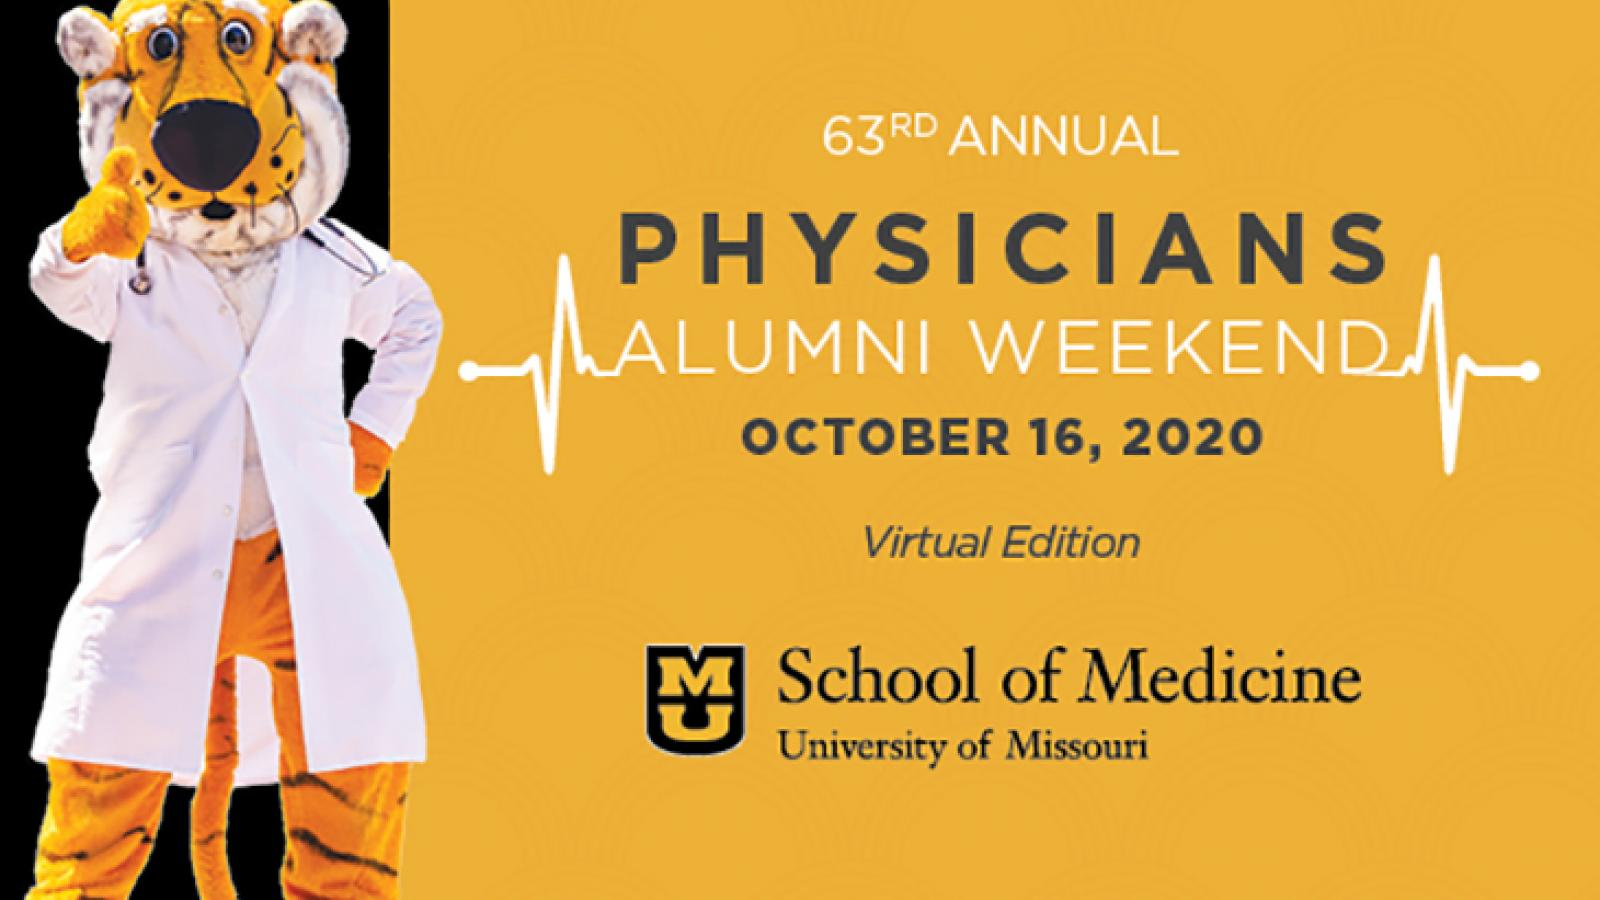 Physicians Alumni Weekend Invitation 2020 – Virtual Edition